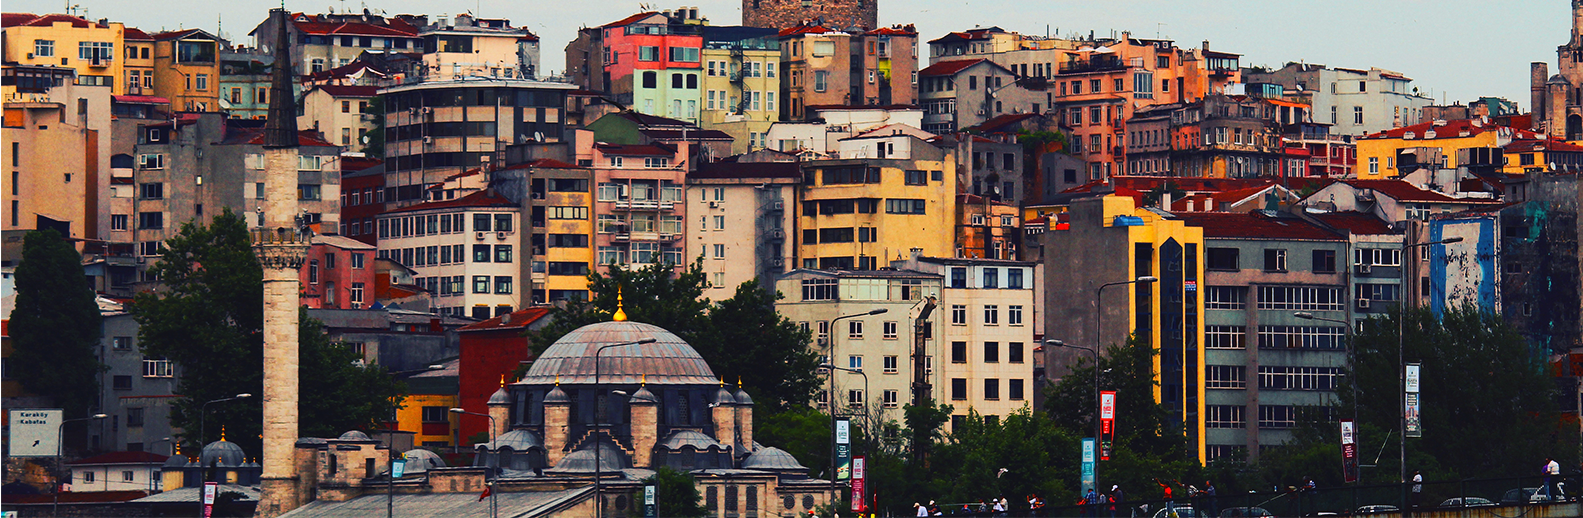 Cali4Travel - Turkey